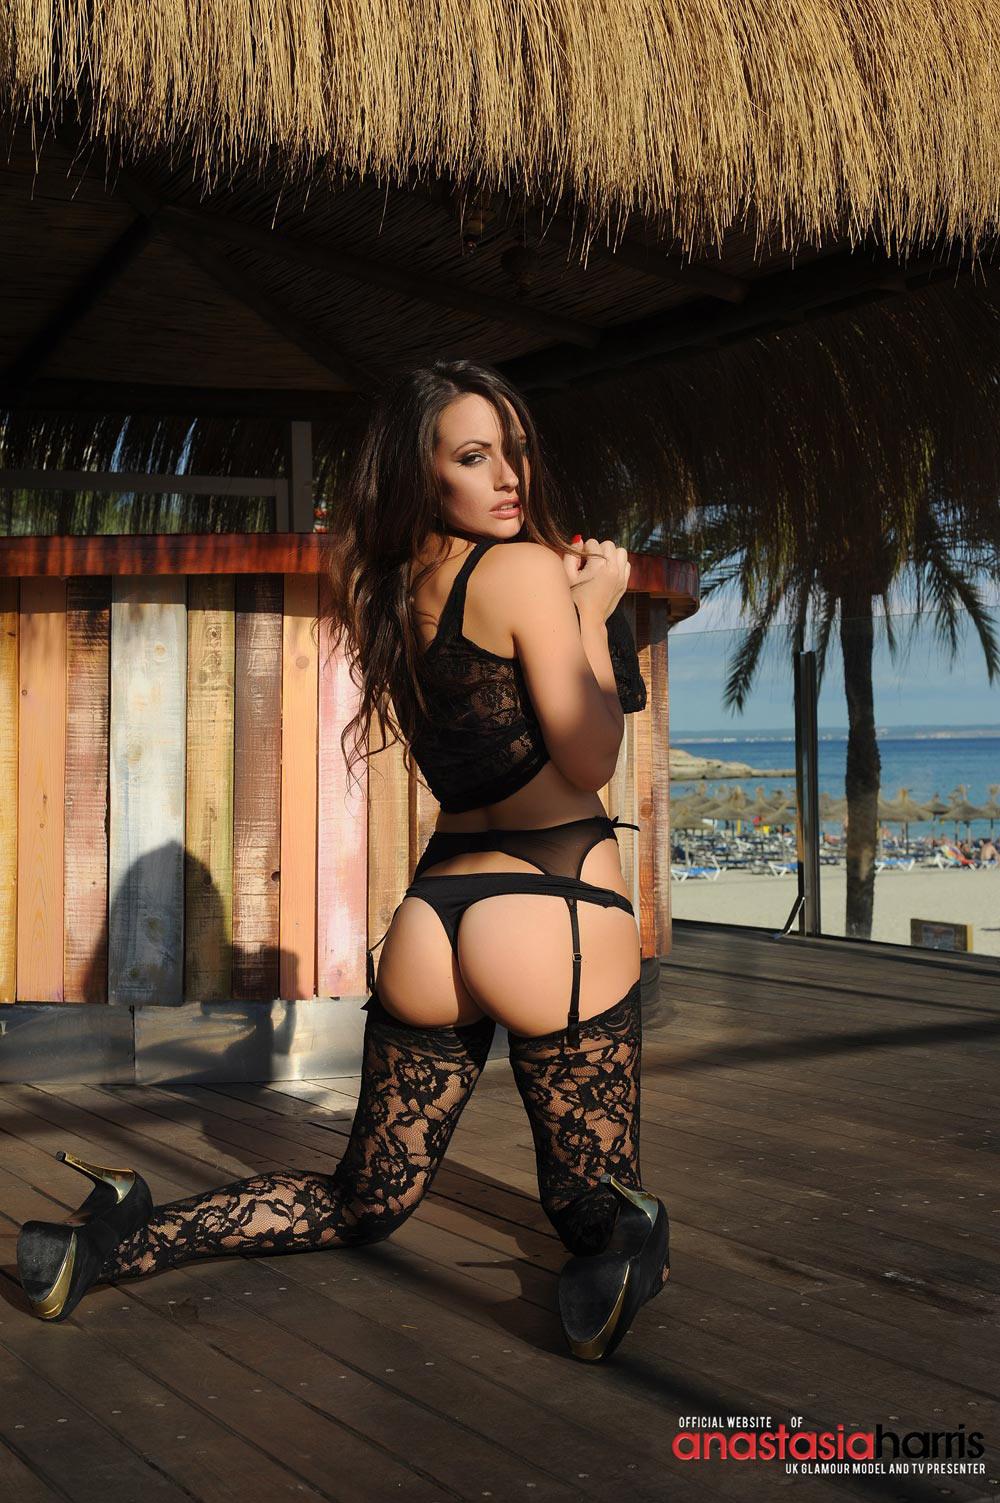 Anastasia Mayo Y Torbe anastasia harris anastasia in black lingerie and stockings